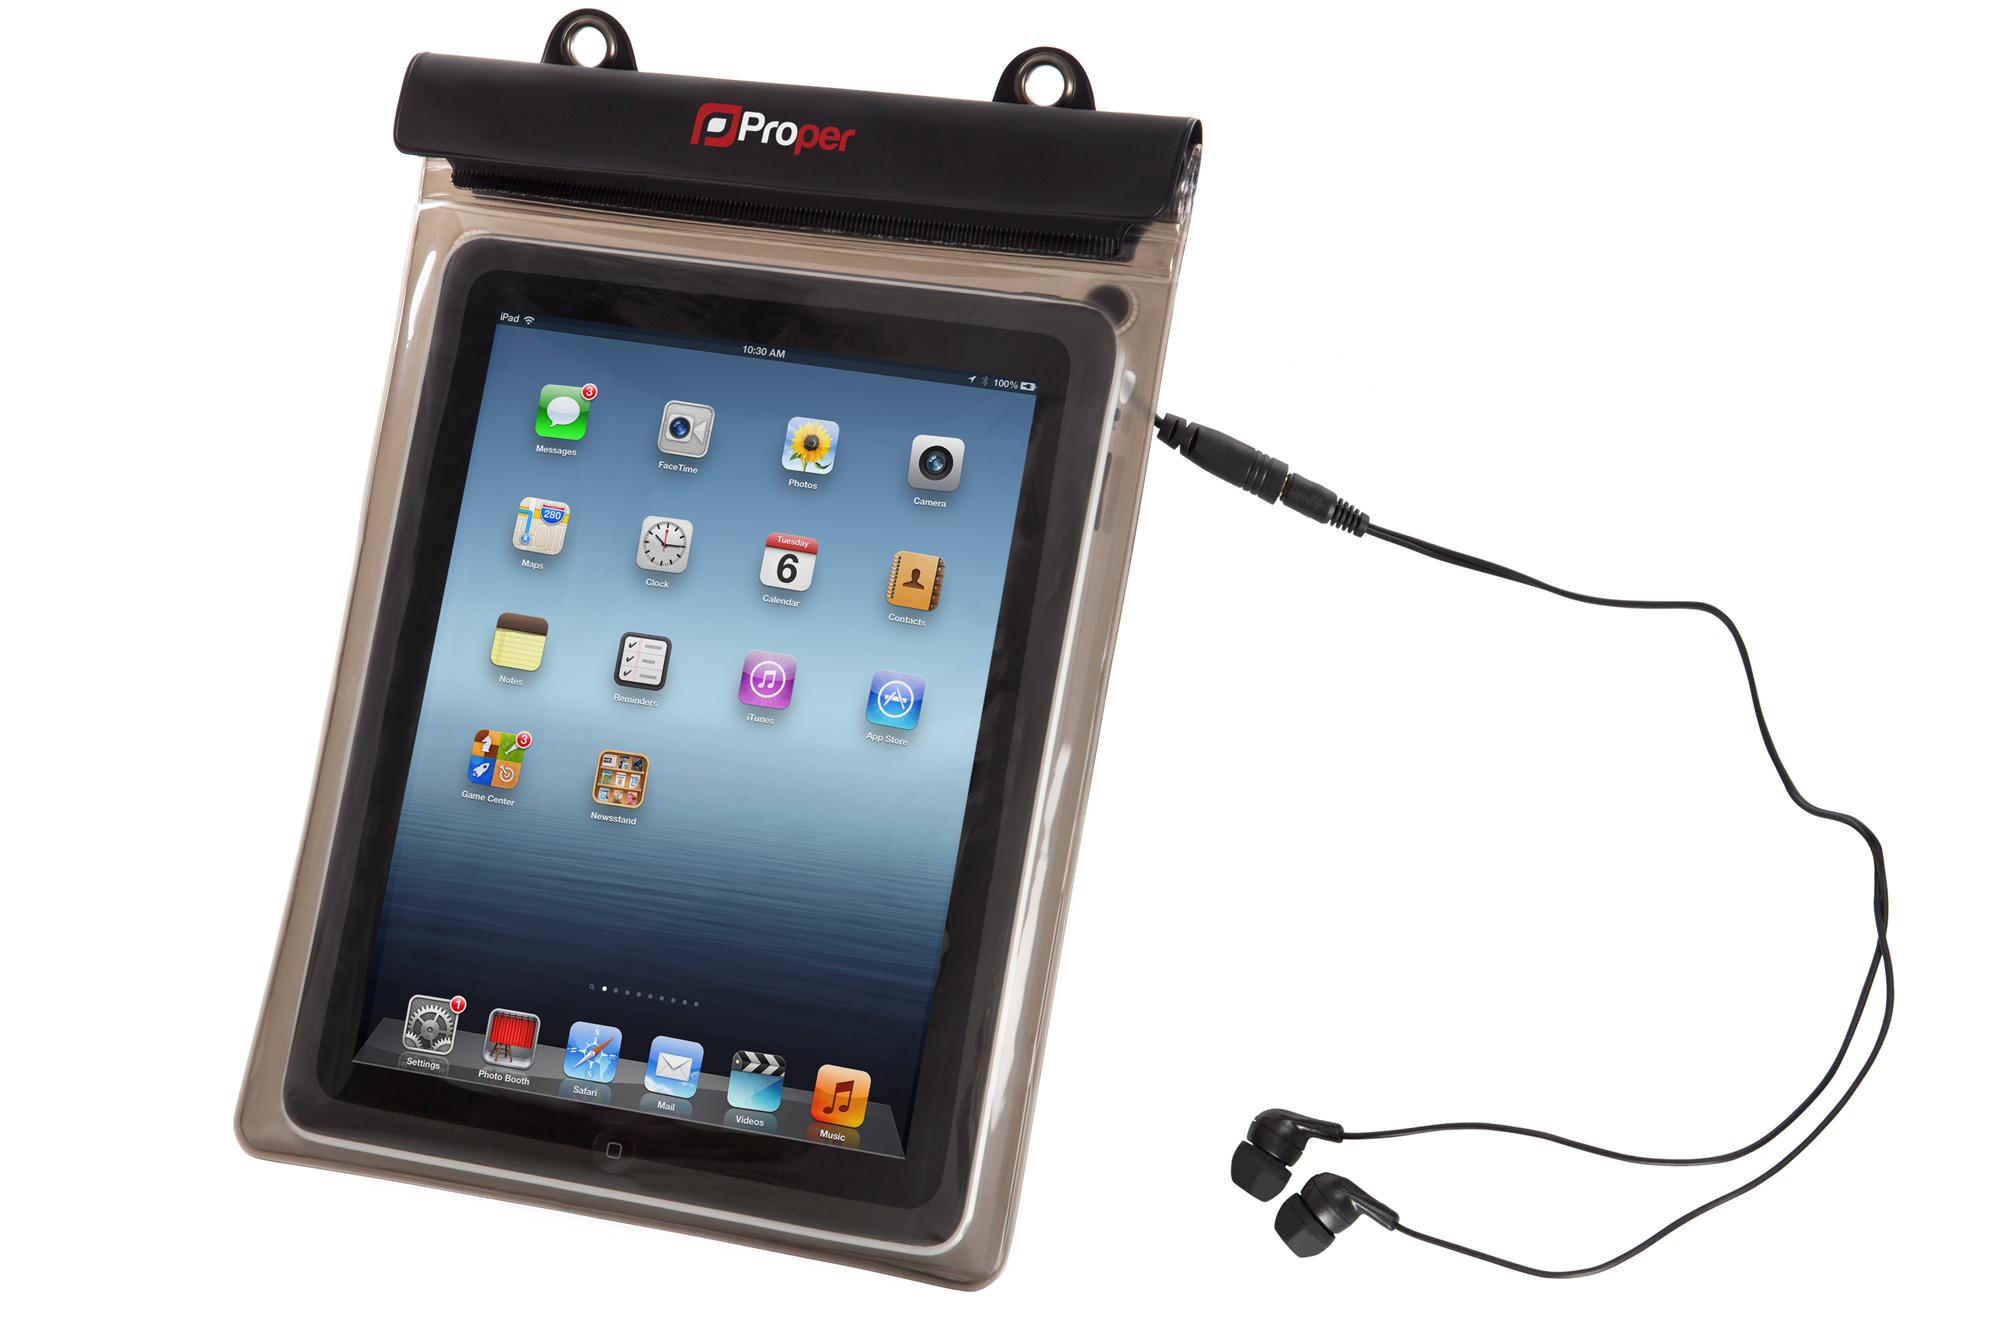 PROPERAV Proper Waterproof Case for 10 inch Tablets inc Waterproof Earphones